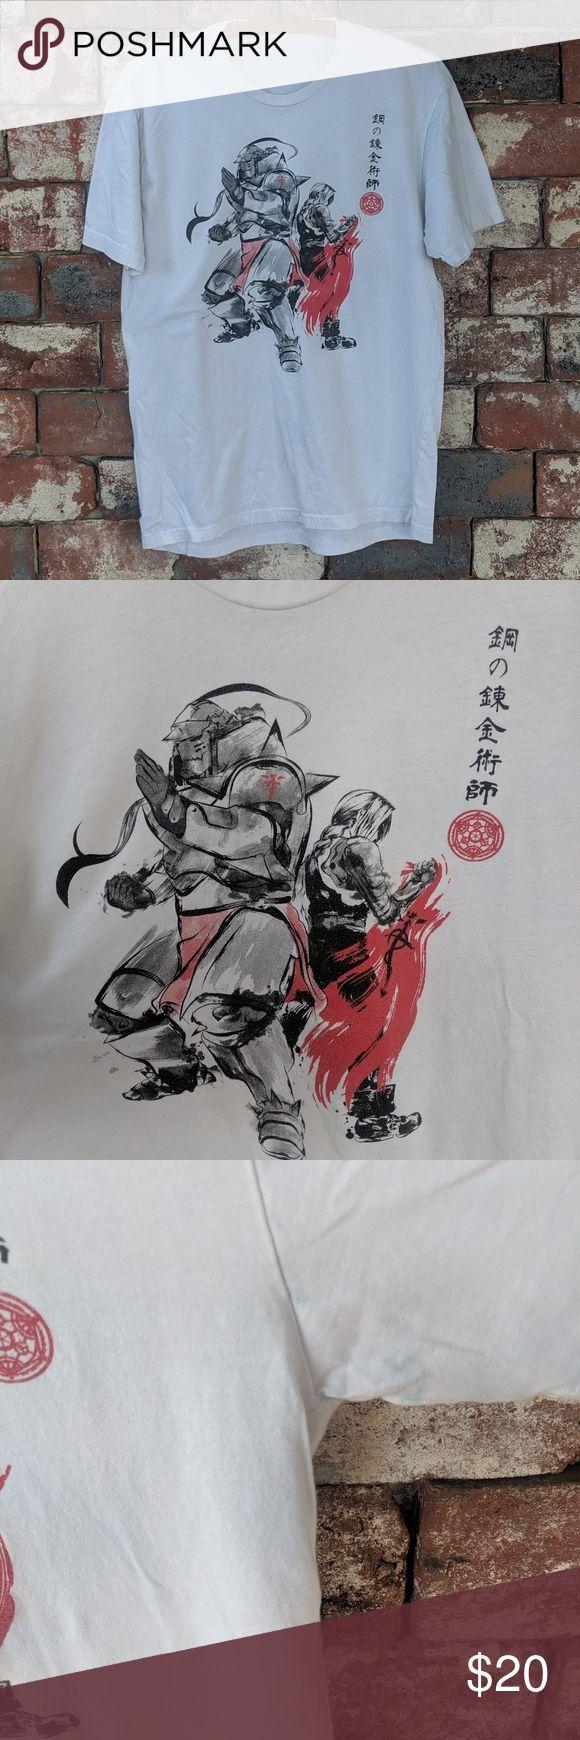 Fullmetal Alchemist anime tshirt Fullmetal Alchemist anime tshirt No size tag  Fullmetal Alchemist anime tshirt Fullmetal Alchemist anime tshirt No size tag